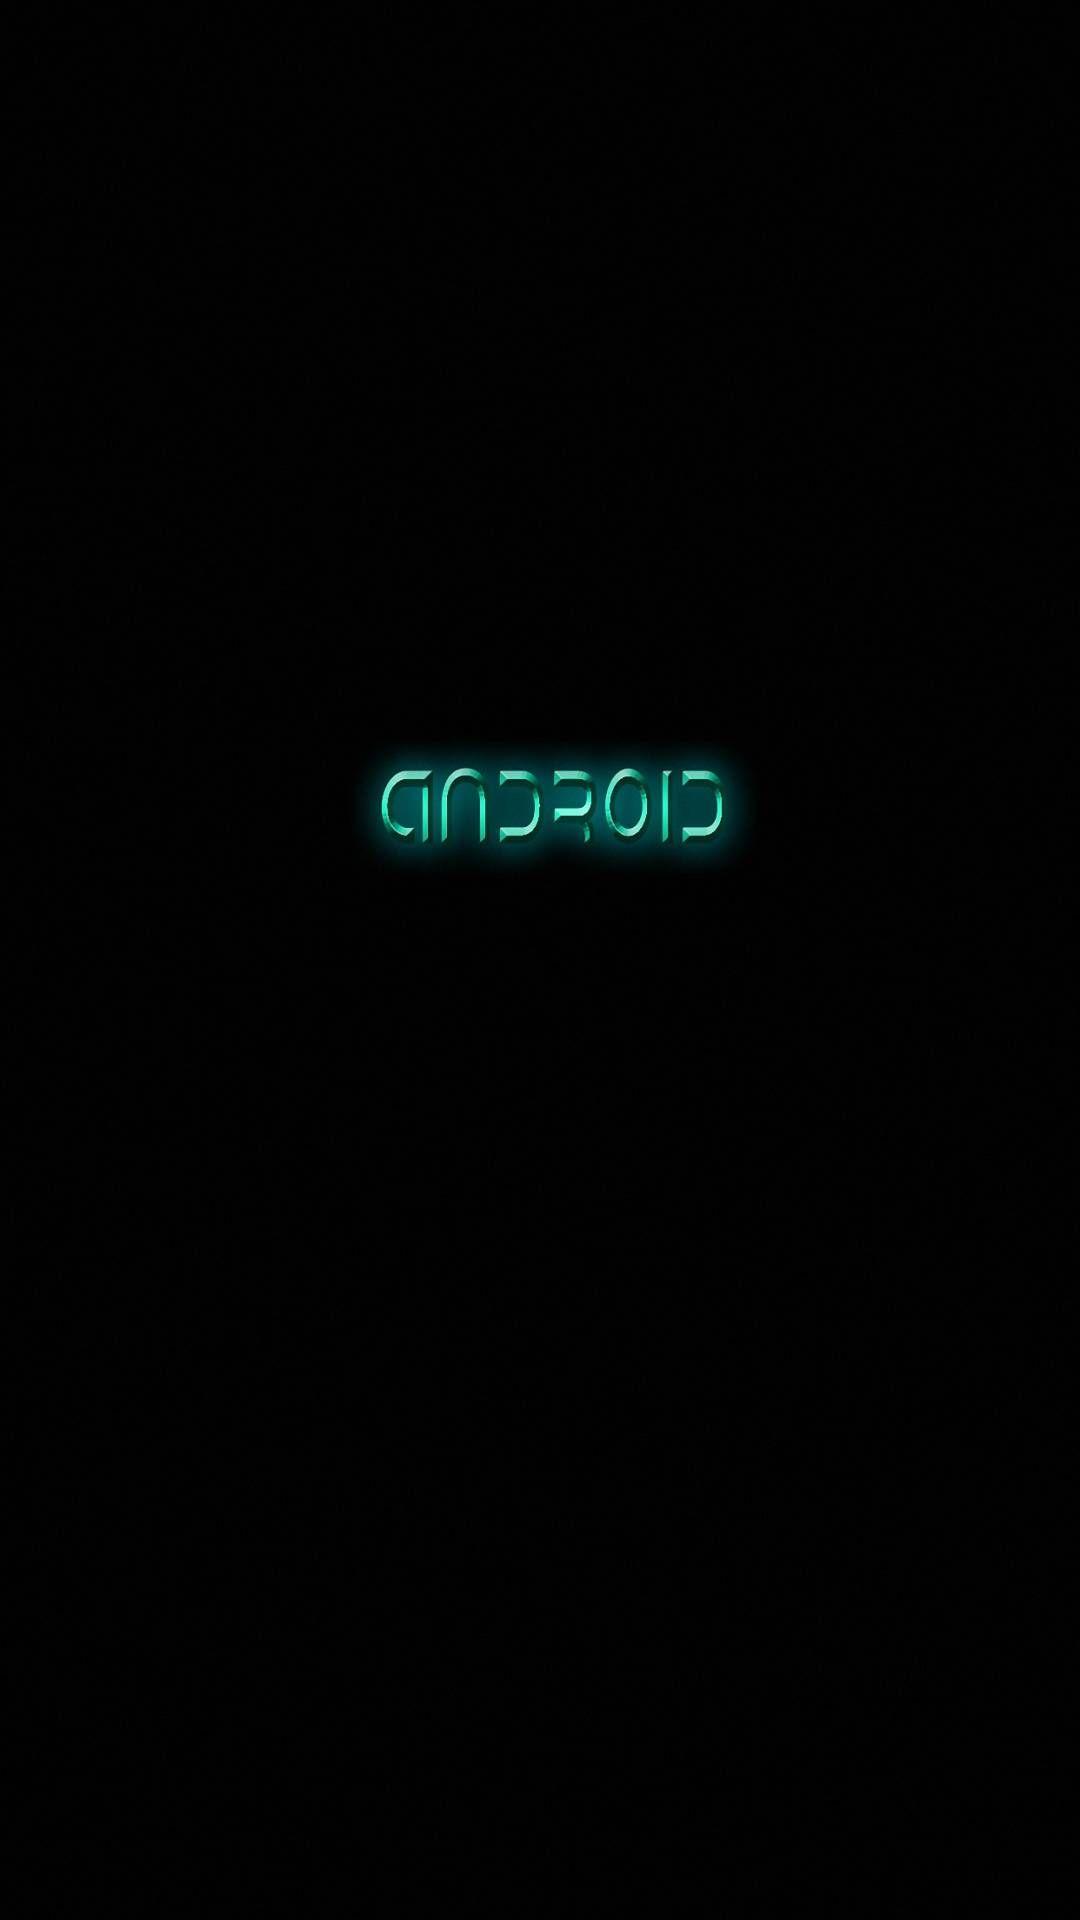 httpwallpaperformobile org17306text wallpaper android